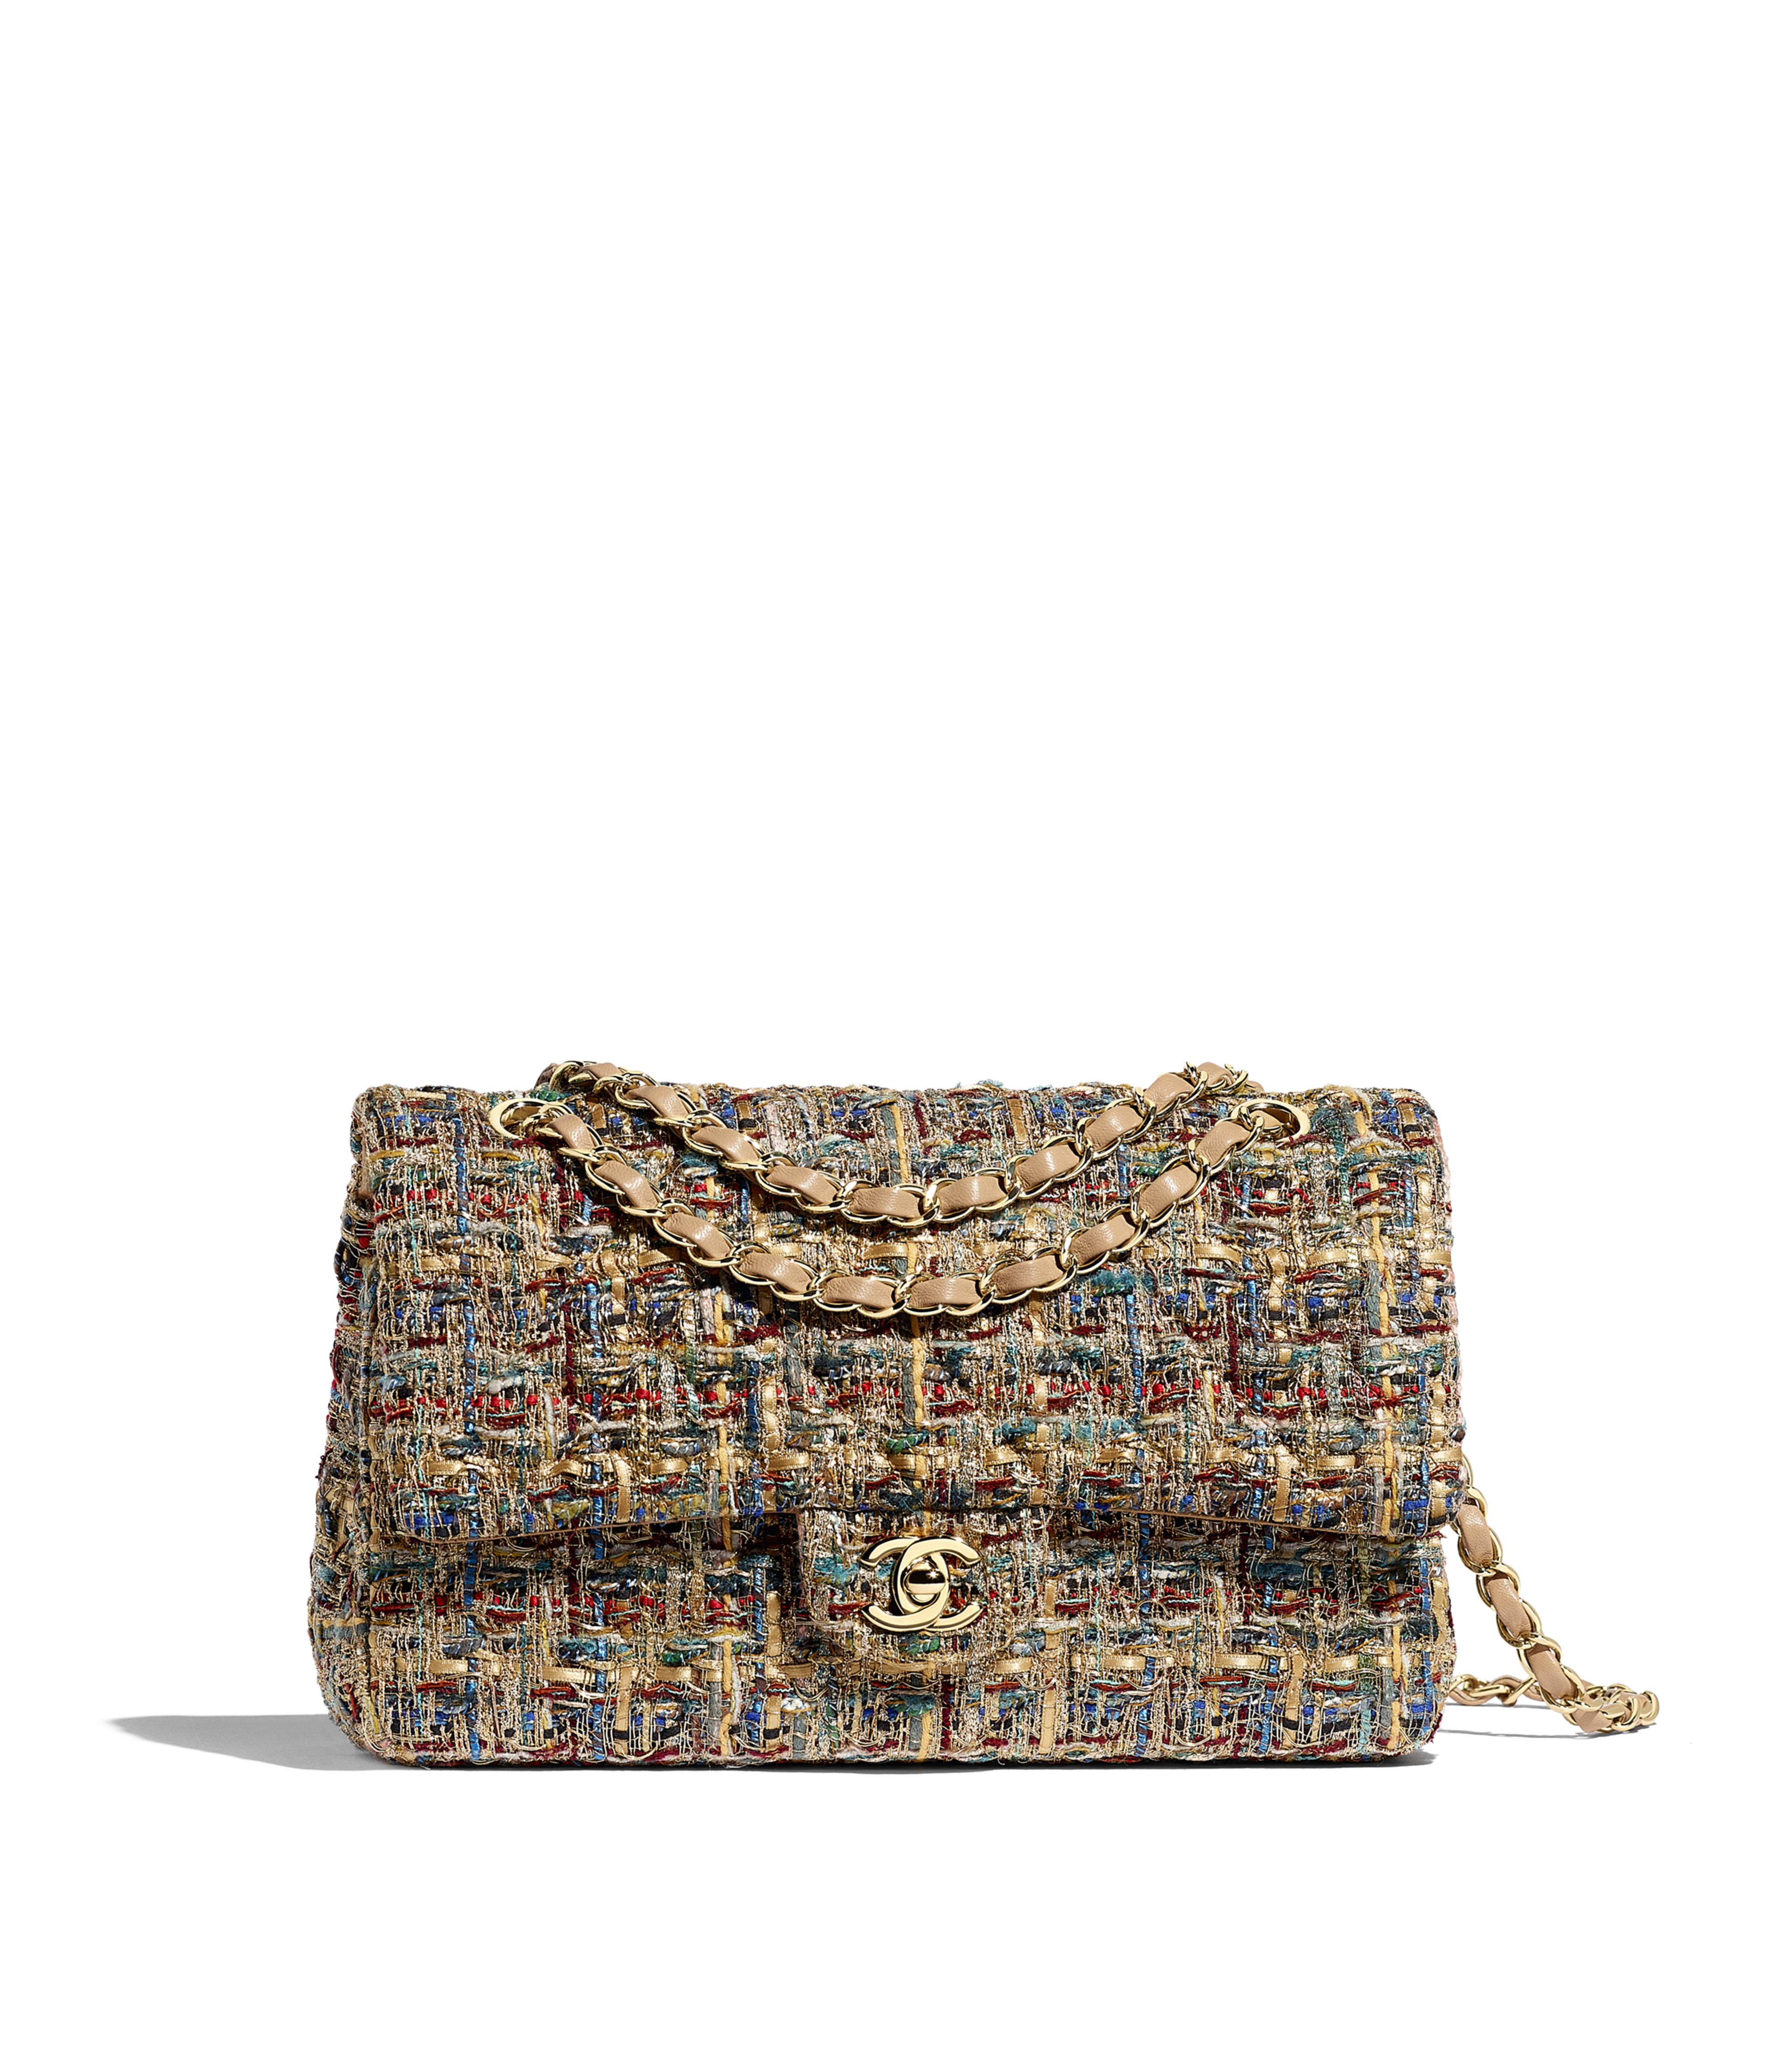 c71c3f43e2c75b Classic Handbag Tweed & Gold-Tone Metal, Gold, Blue & Green Ref.  A01112B01026MG529